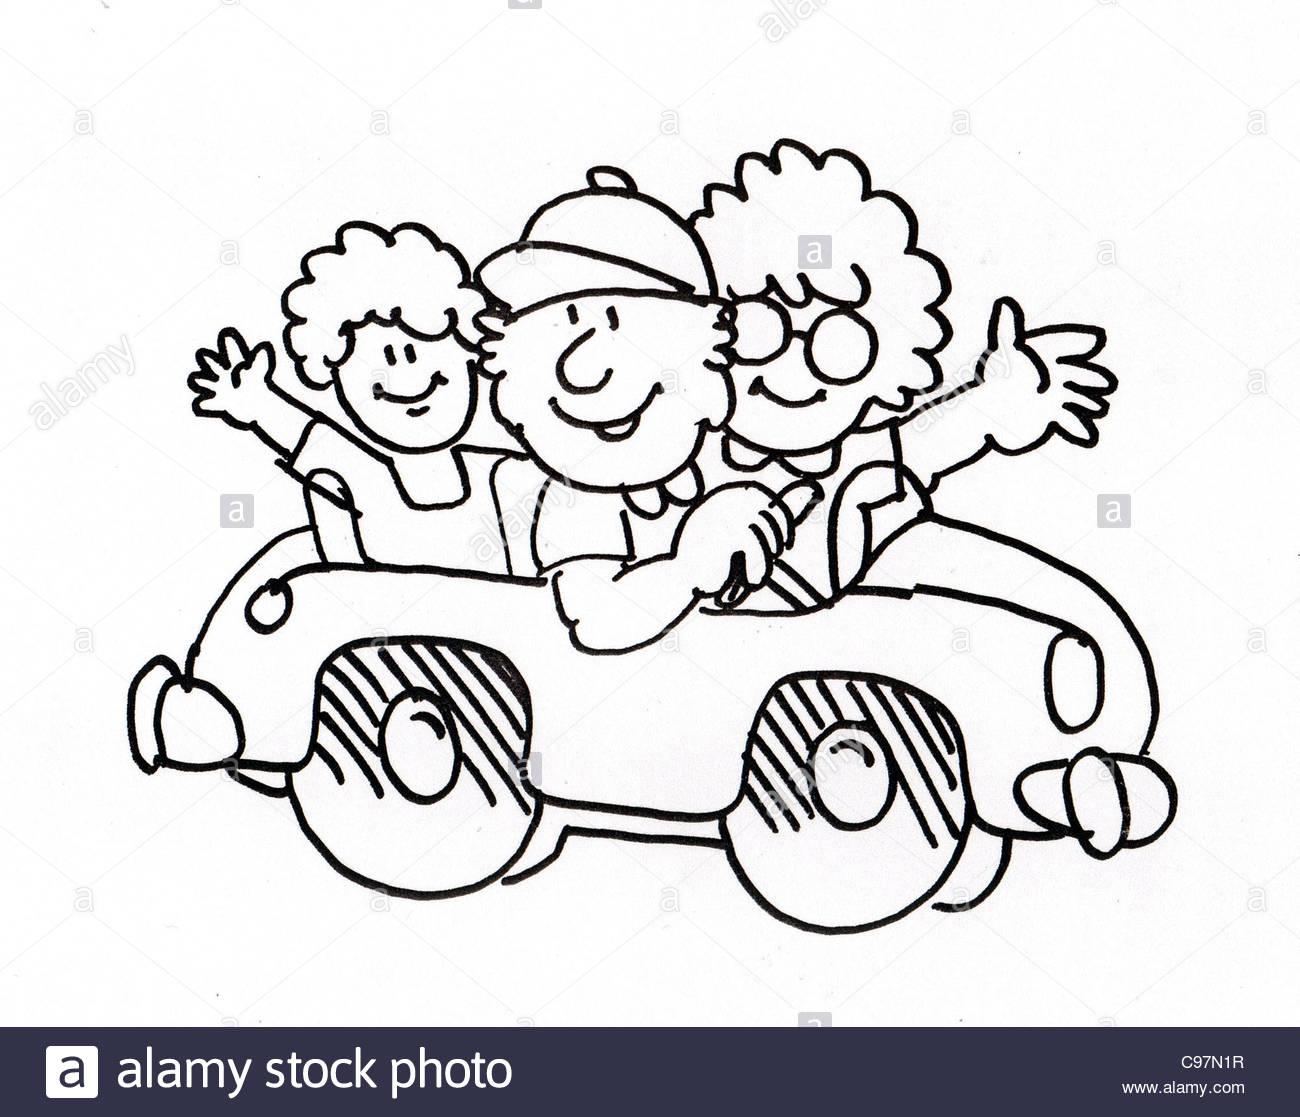 s cars automobile stock photos s cars automobile stock images alamy 1952 Nash Airflyte auto auto autos car cars automobile pkw vehicle vehicles fcc motor vehicle stock image